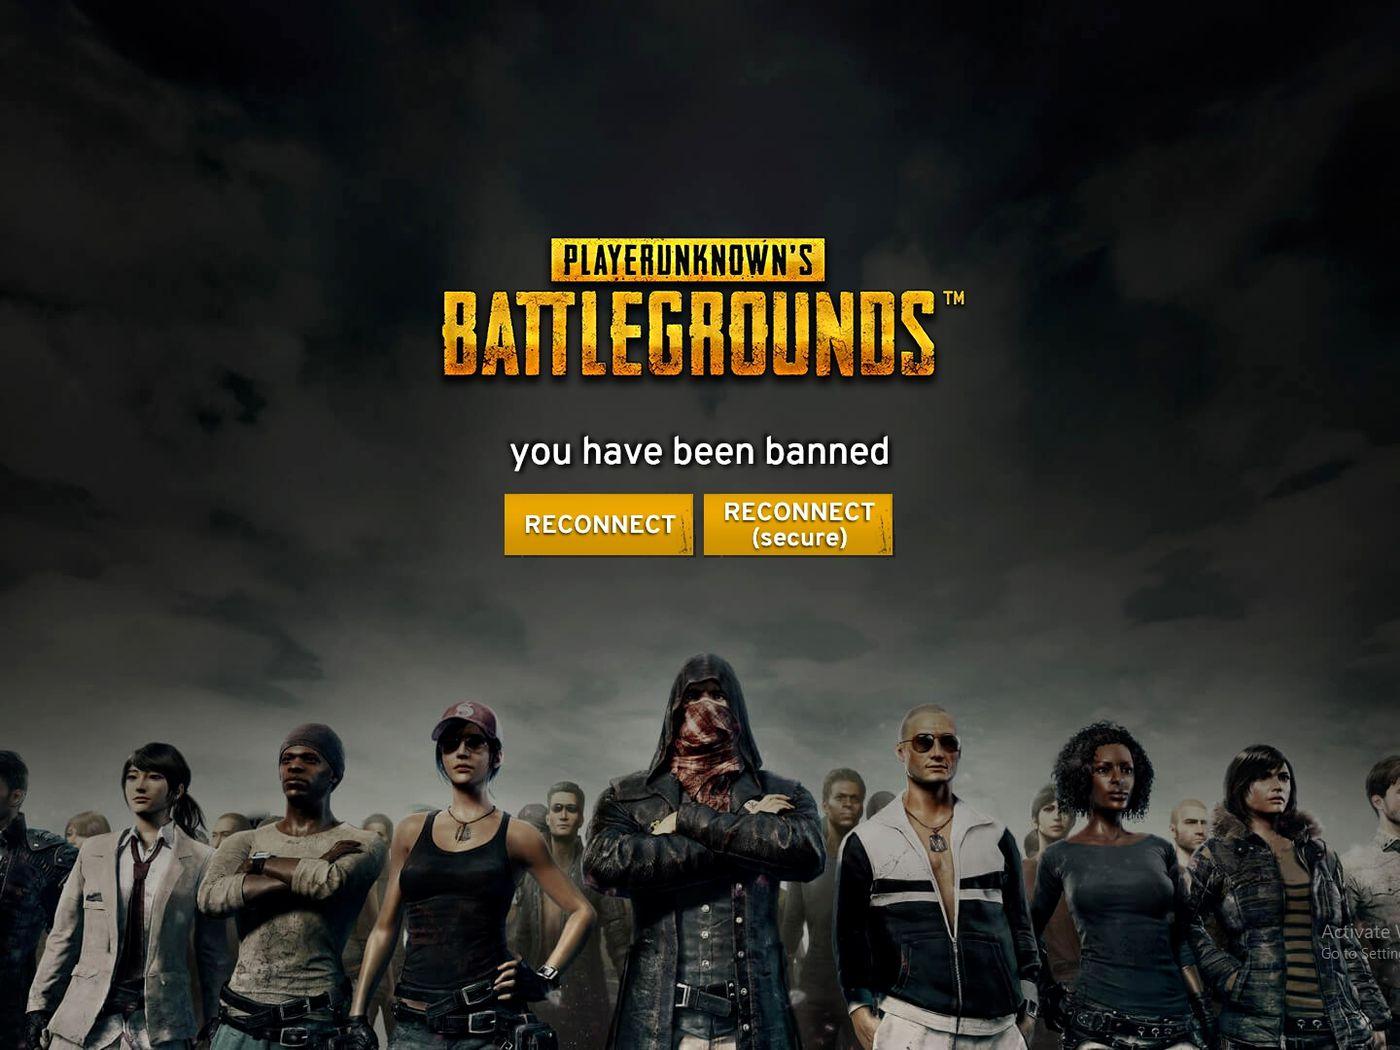 Playerunknown's Battlegrounds 'stream sniping' ban divides